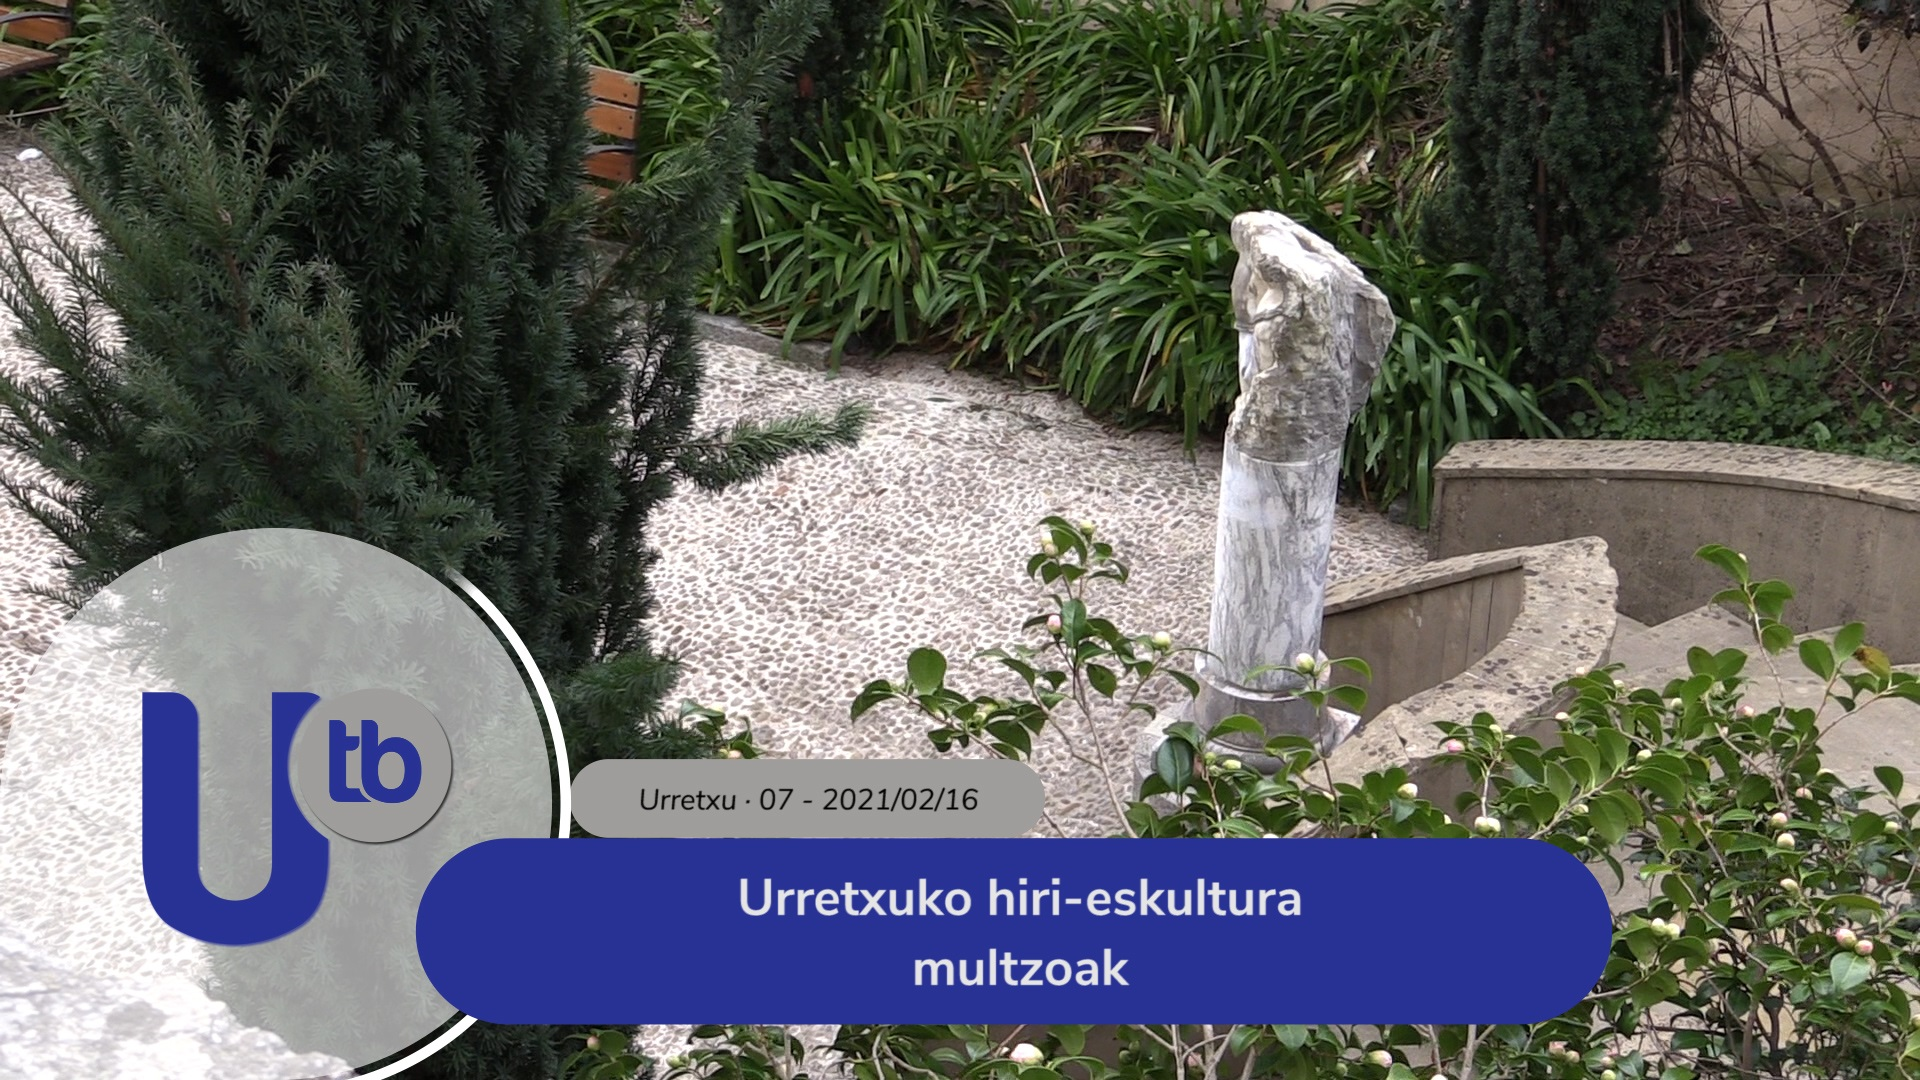 Urretxuko hiri-eskultura multzoak / Conjuntos escultóricos de Urretxu